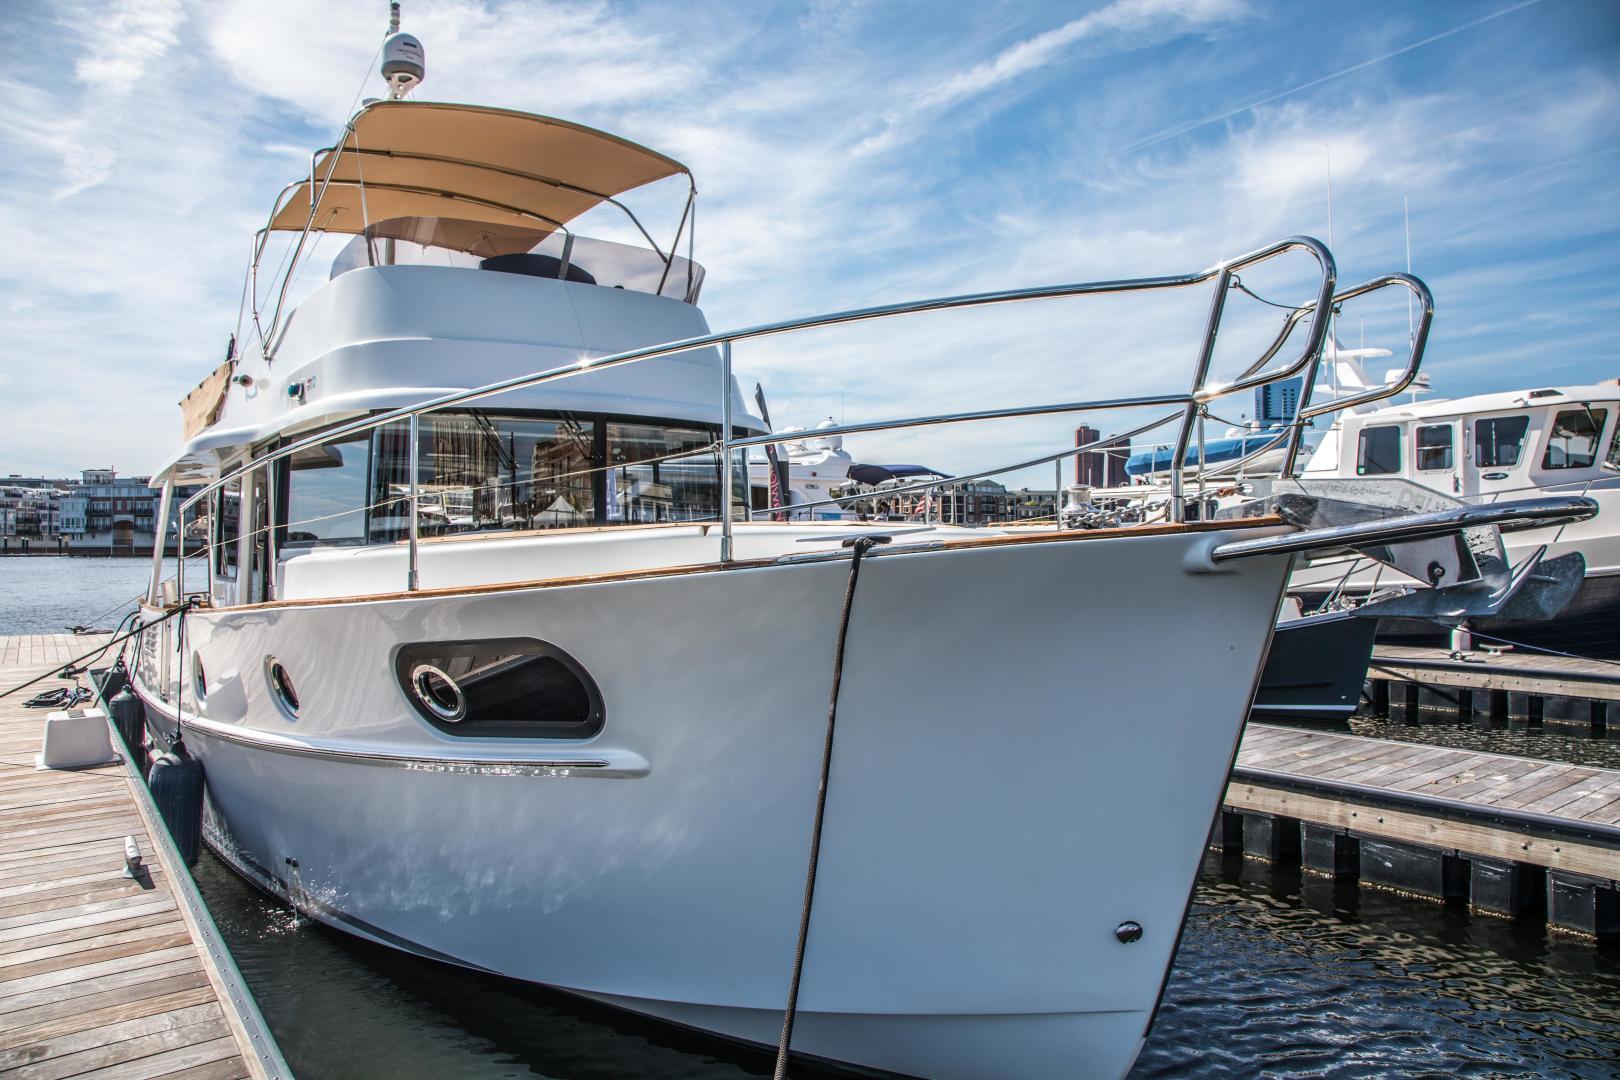 Beneteau-Swift Trawler 2012-MLC IV Baltimore-Maryland-United States-1355970 | Thumbnail